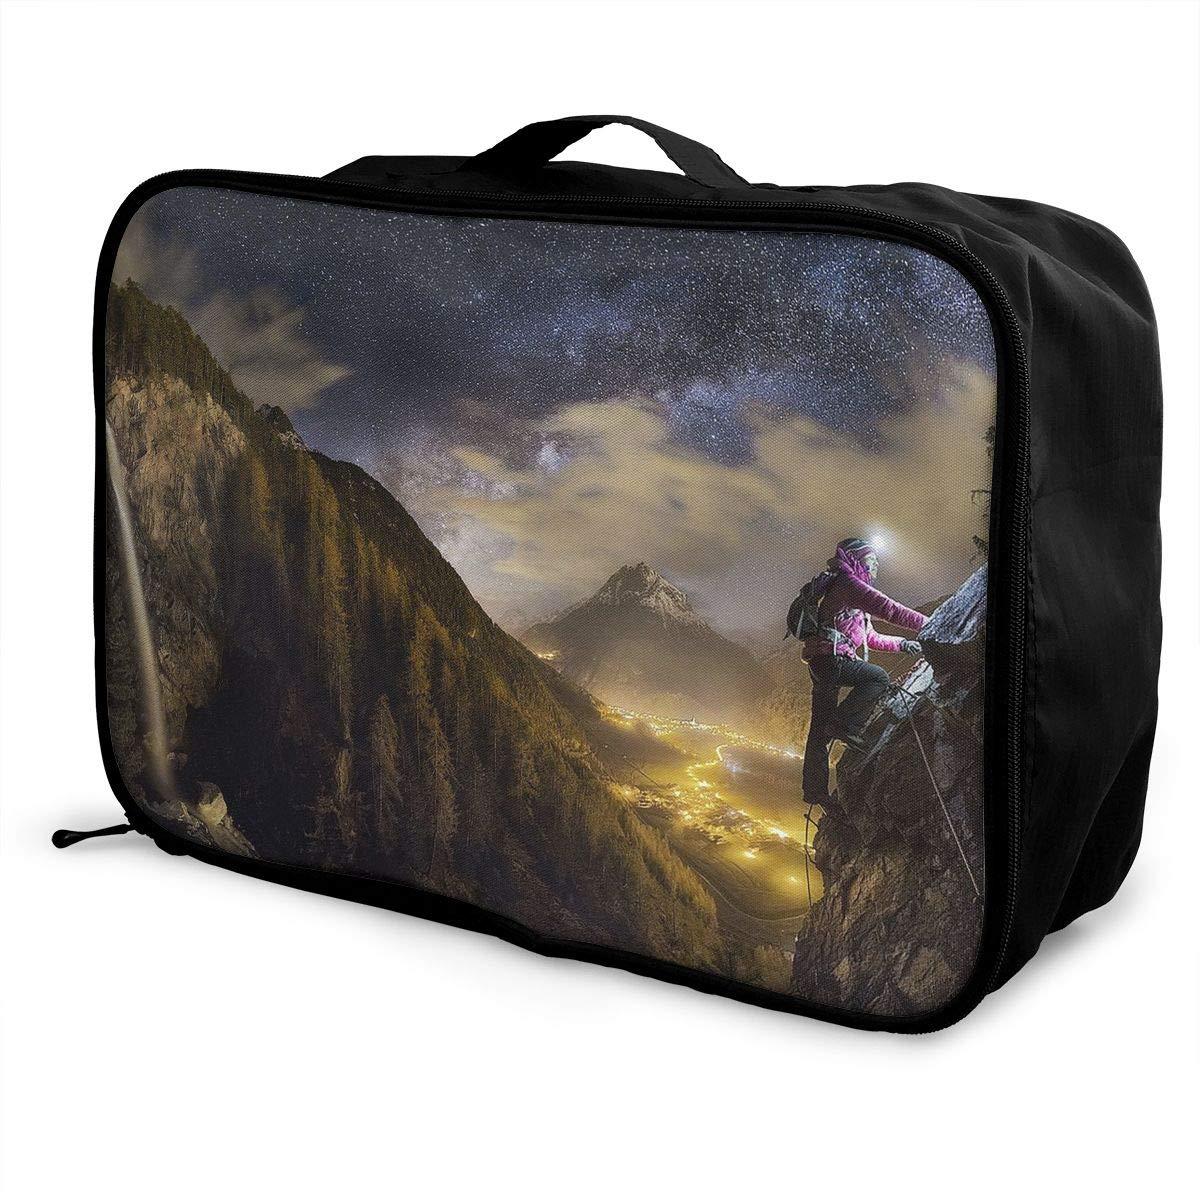 Travel Luggage Duffle Bag Lightweight Portable Handbag Rock Climbing Large Capacity Waterproof Foldable Storage Tote